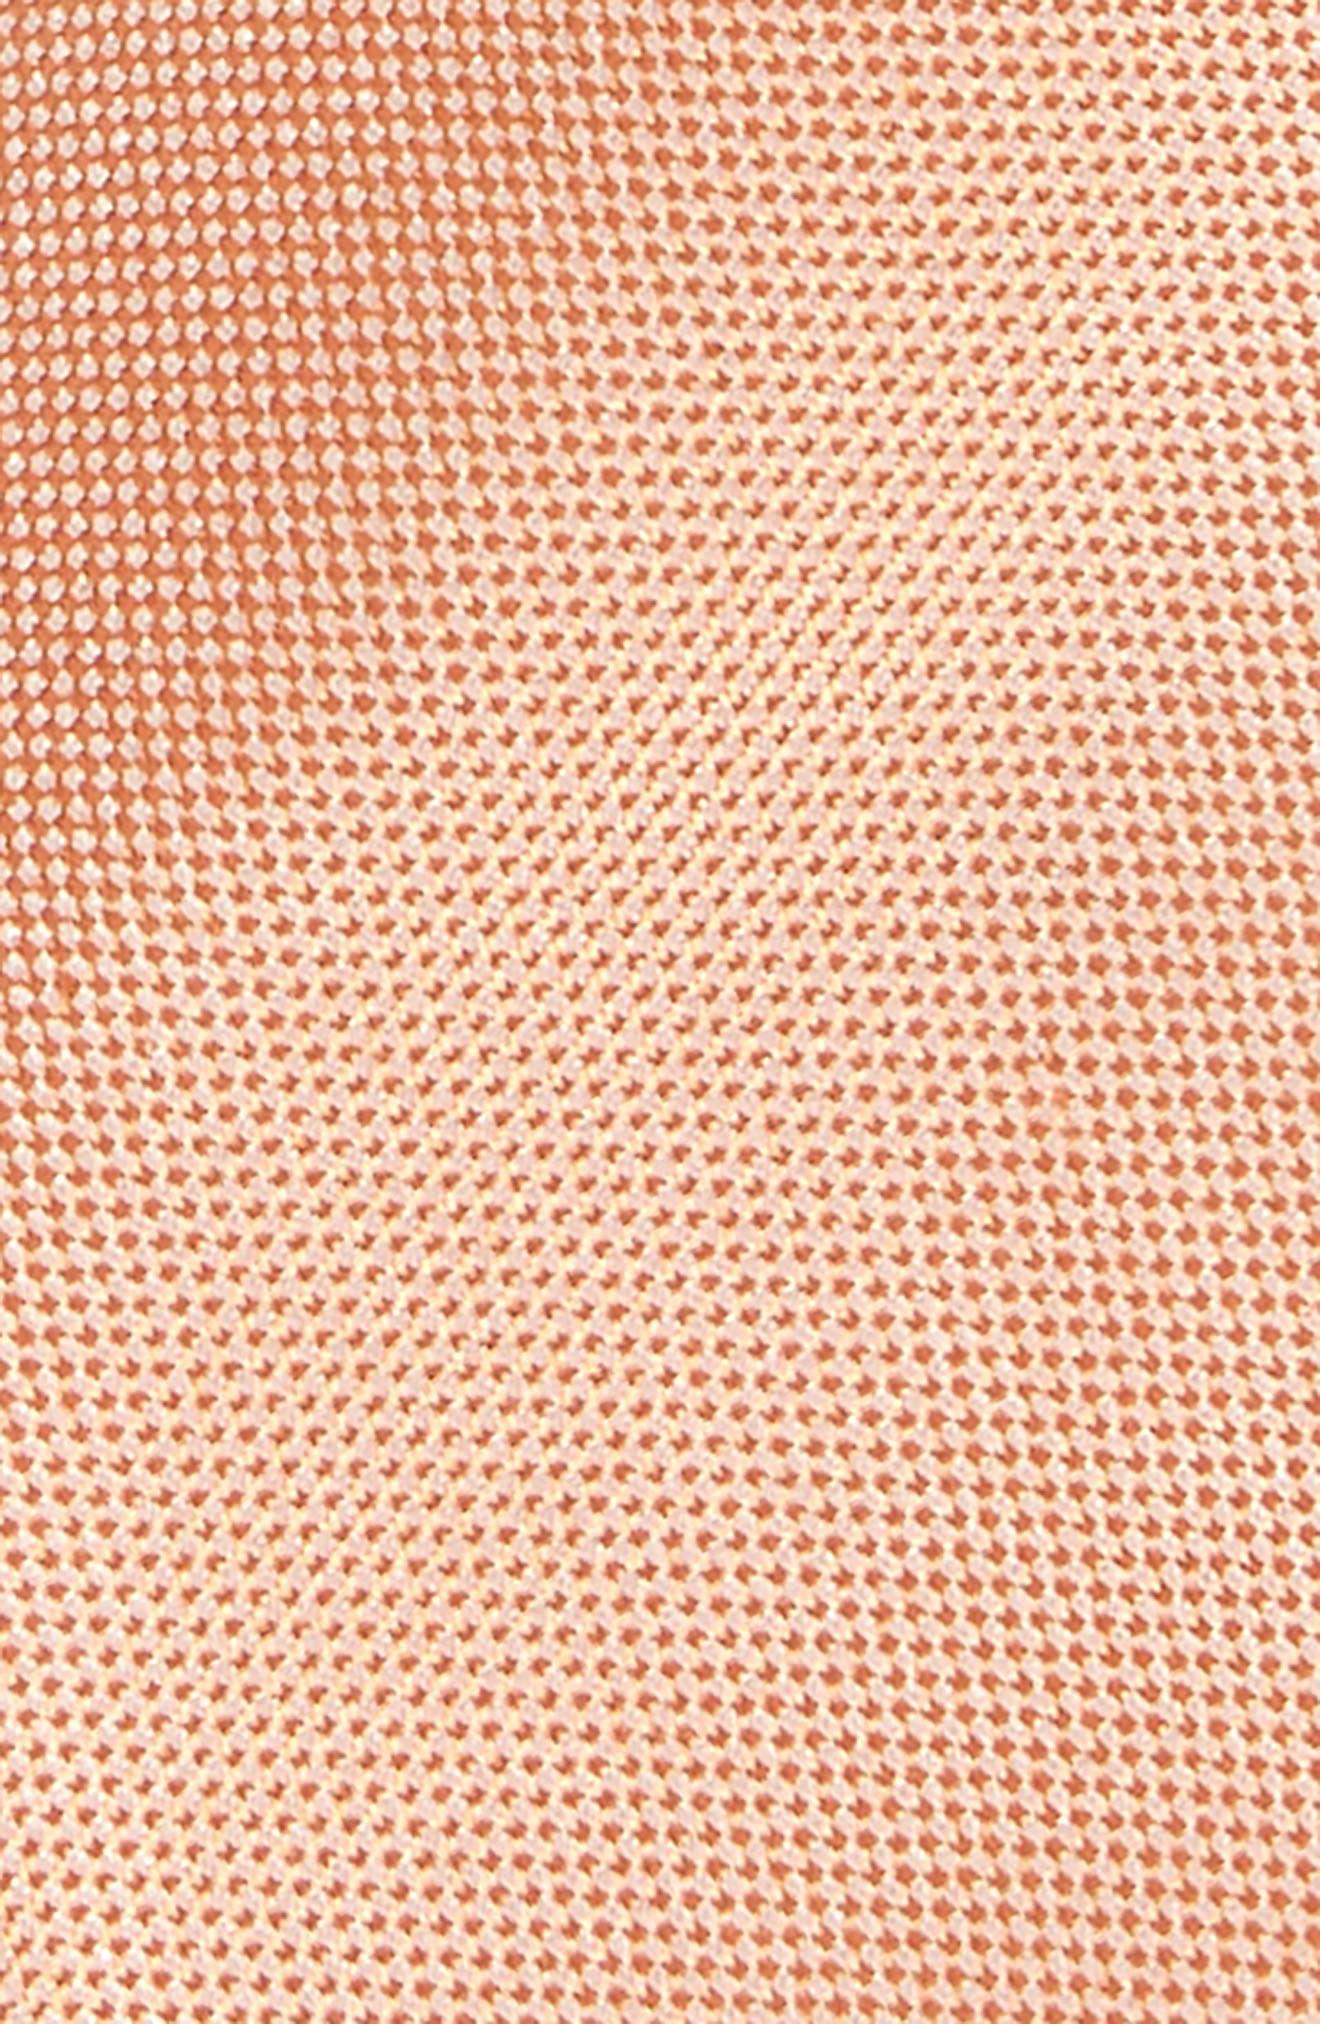 Natte Weave Silk Tie,                             Alternate thumbnail 2, color,                             Orange